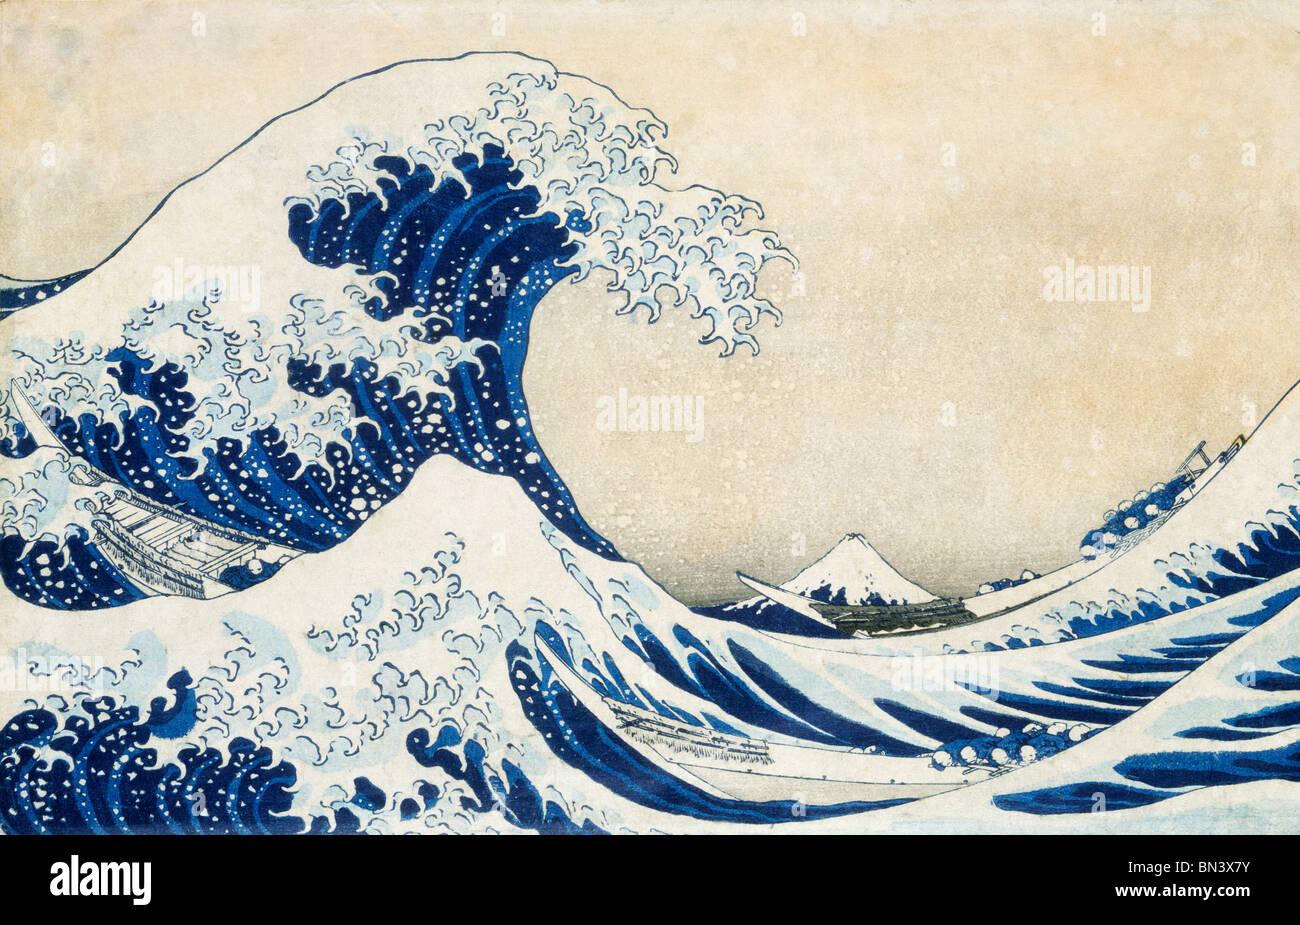 La Gran Ola, de Katsushika Hokusai. El Japón, del siglo XIX. Imagen De Stock